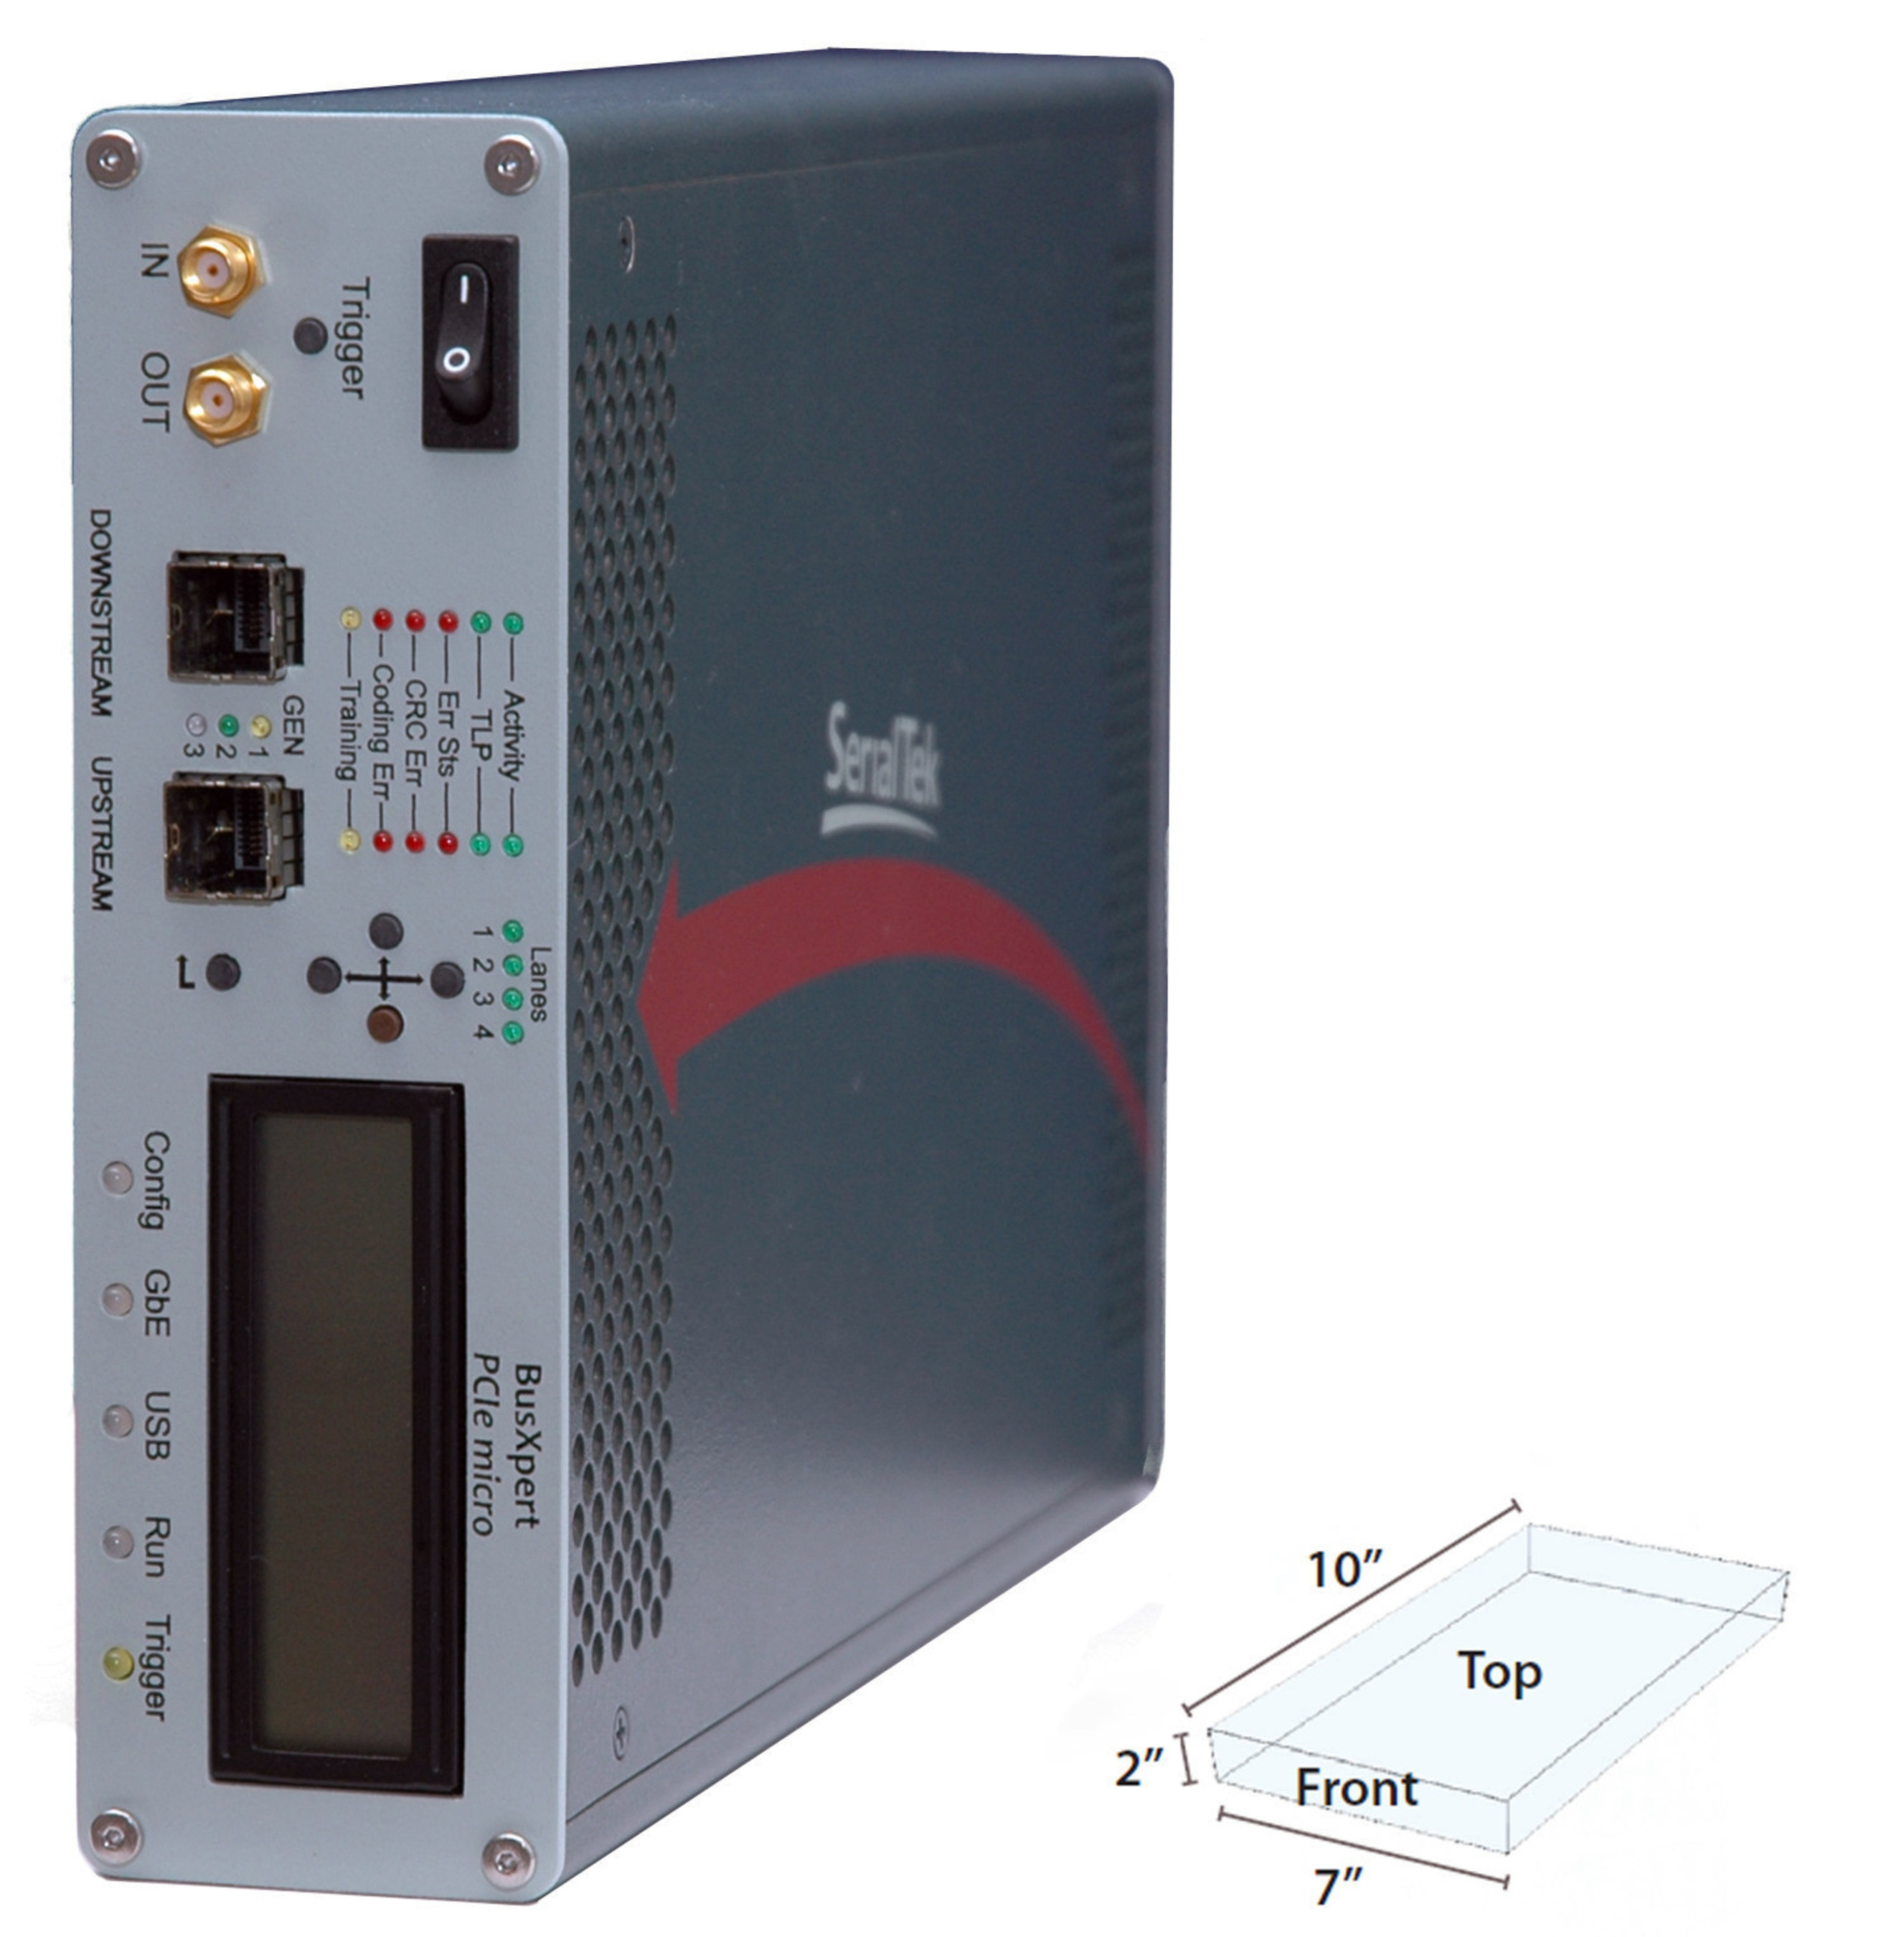 SerialTek's Gen 3 BusXpert Micro PCI Express Analyzer